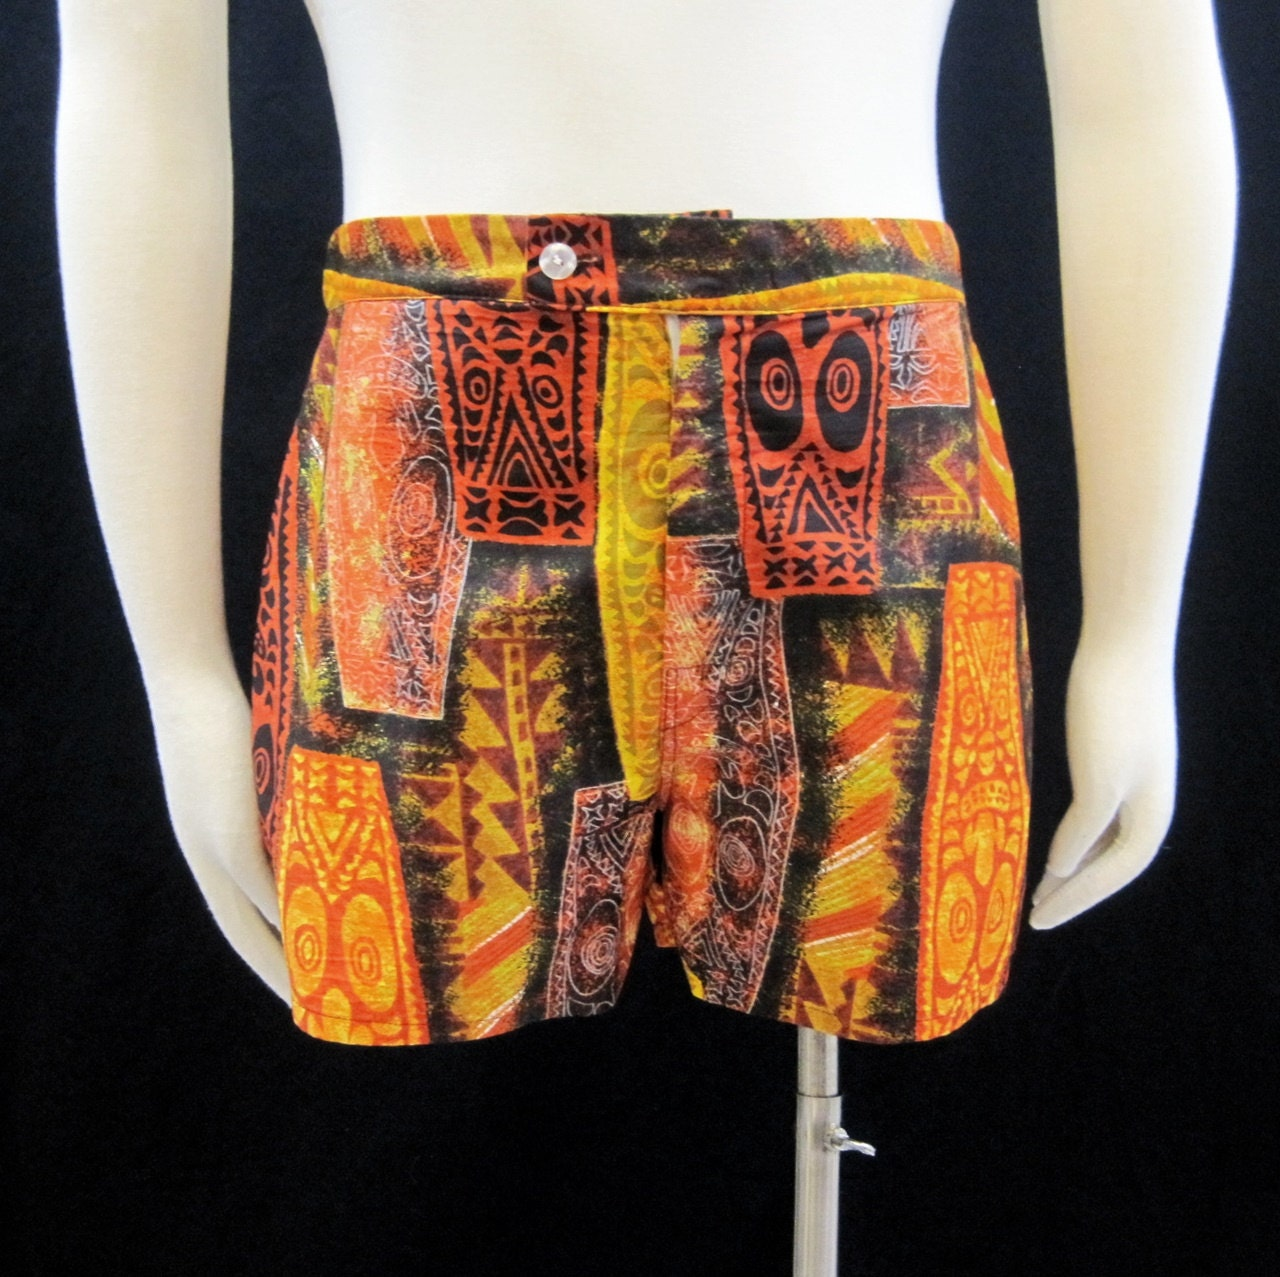 Vintage Mens Swim Trunks 60s Hawaiian Tiki Shorts Swimsuit